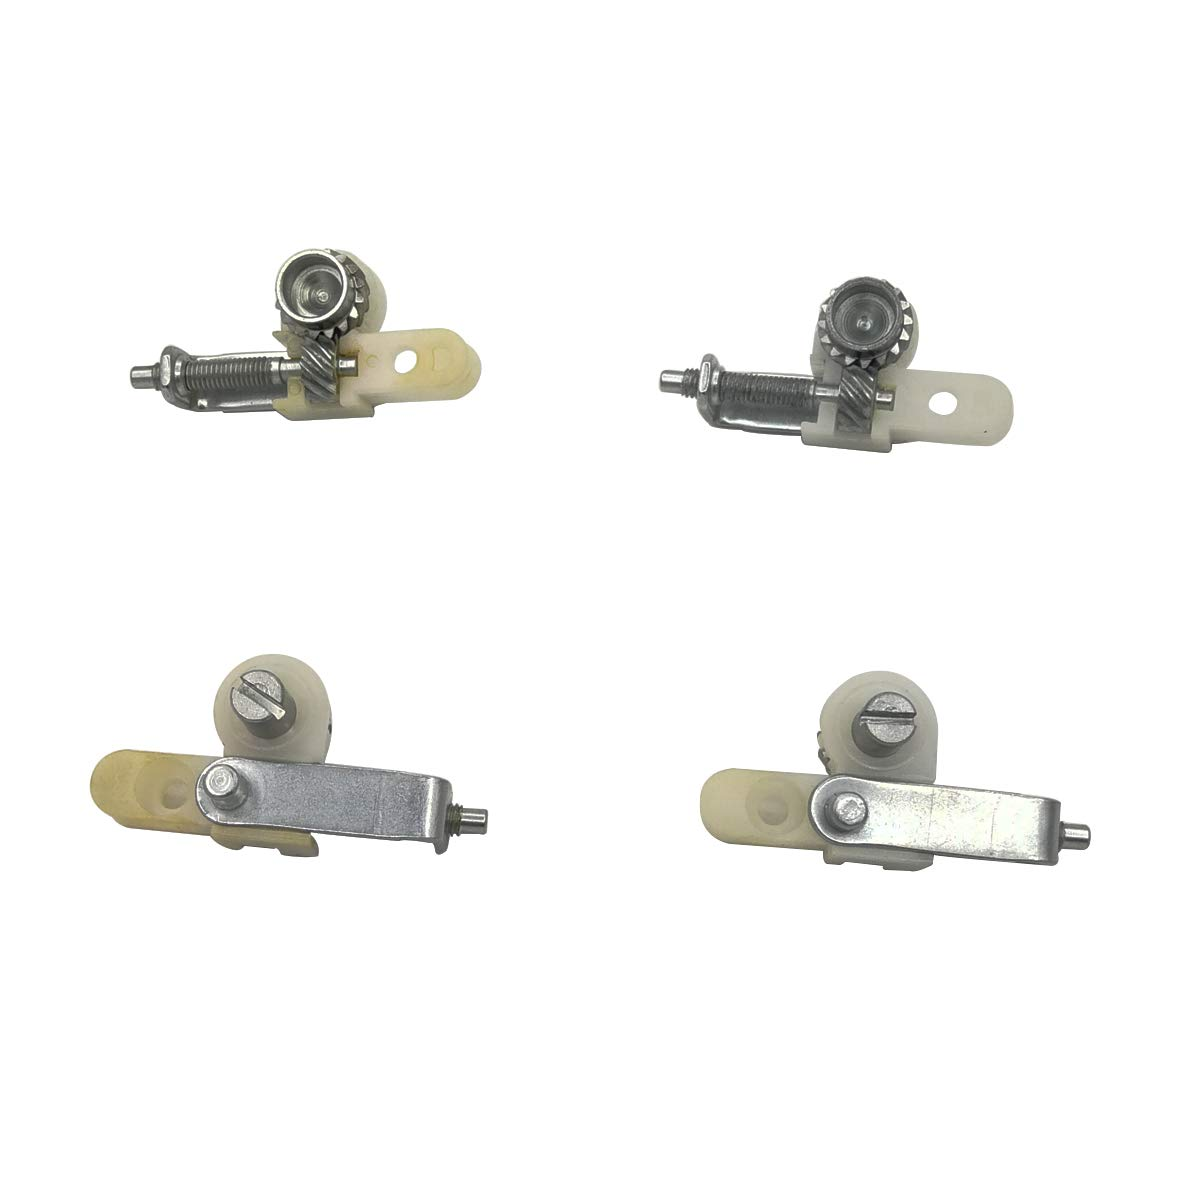 4 pezzi tendicatena regolatore per Stihl 029 039 390 MS290 MS390 MS310 motosega parti Shioshen